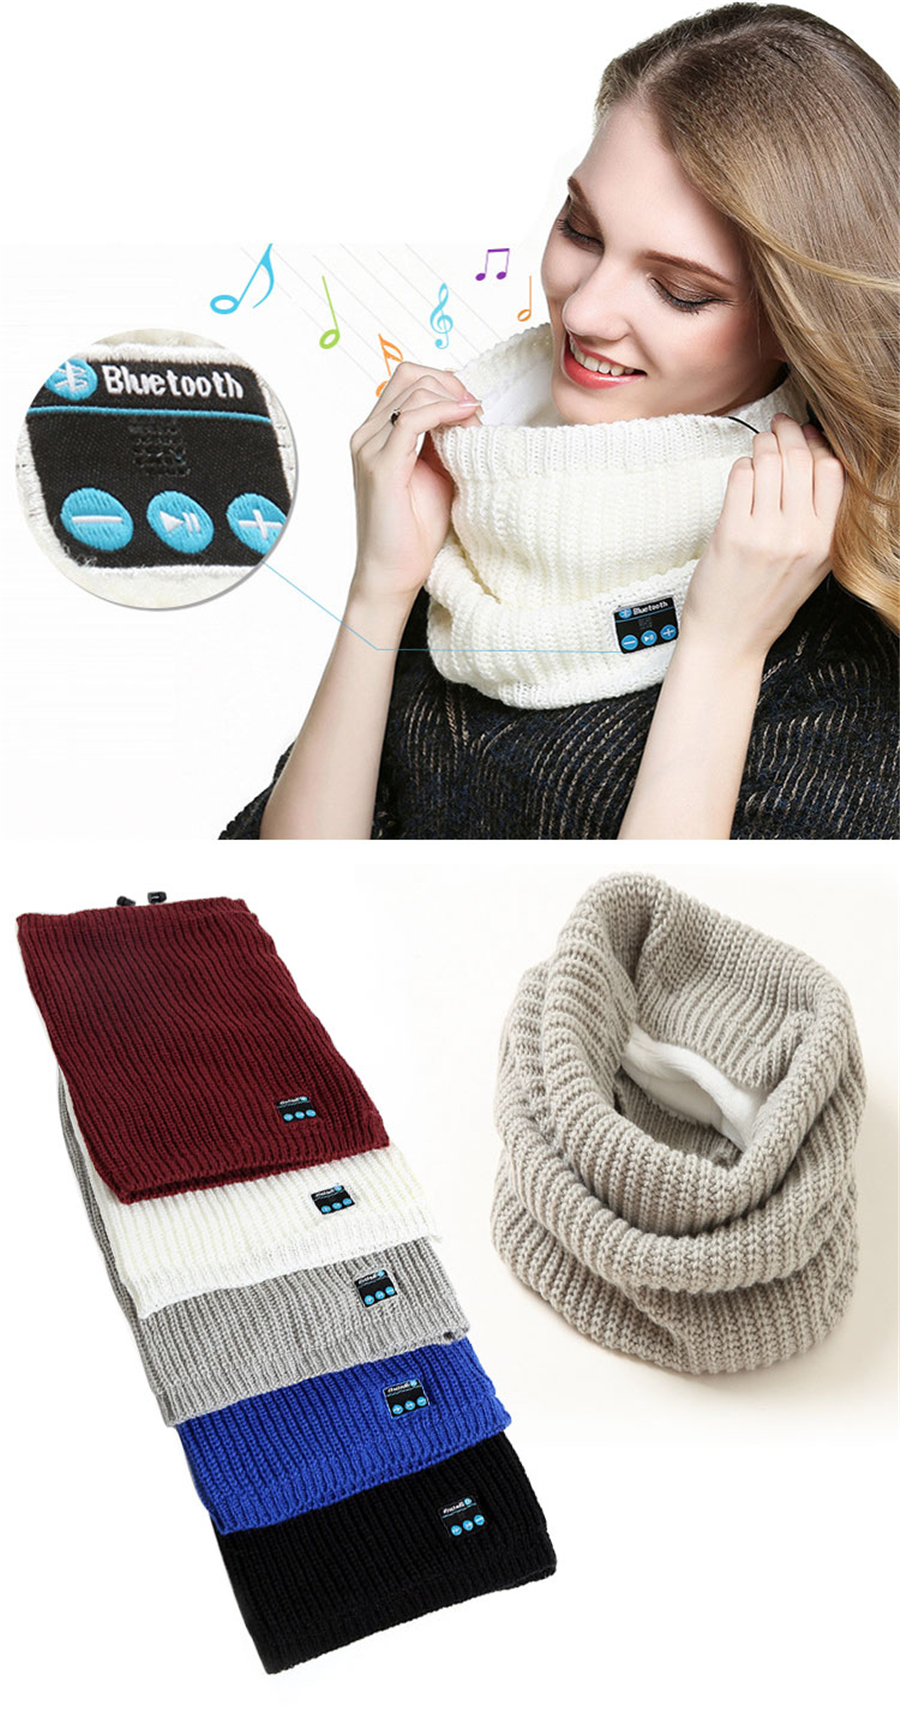 Bluetooth V3.0 Soft Scarf Neckerchief Winter Knitted Design Wireless Bluetooth Smart Scarf Headset Headphone Speaker Microphone